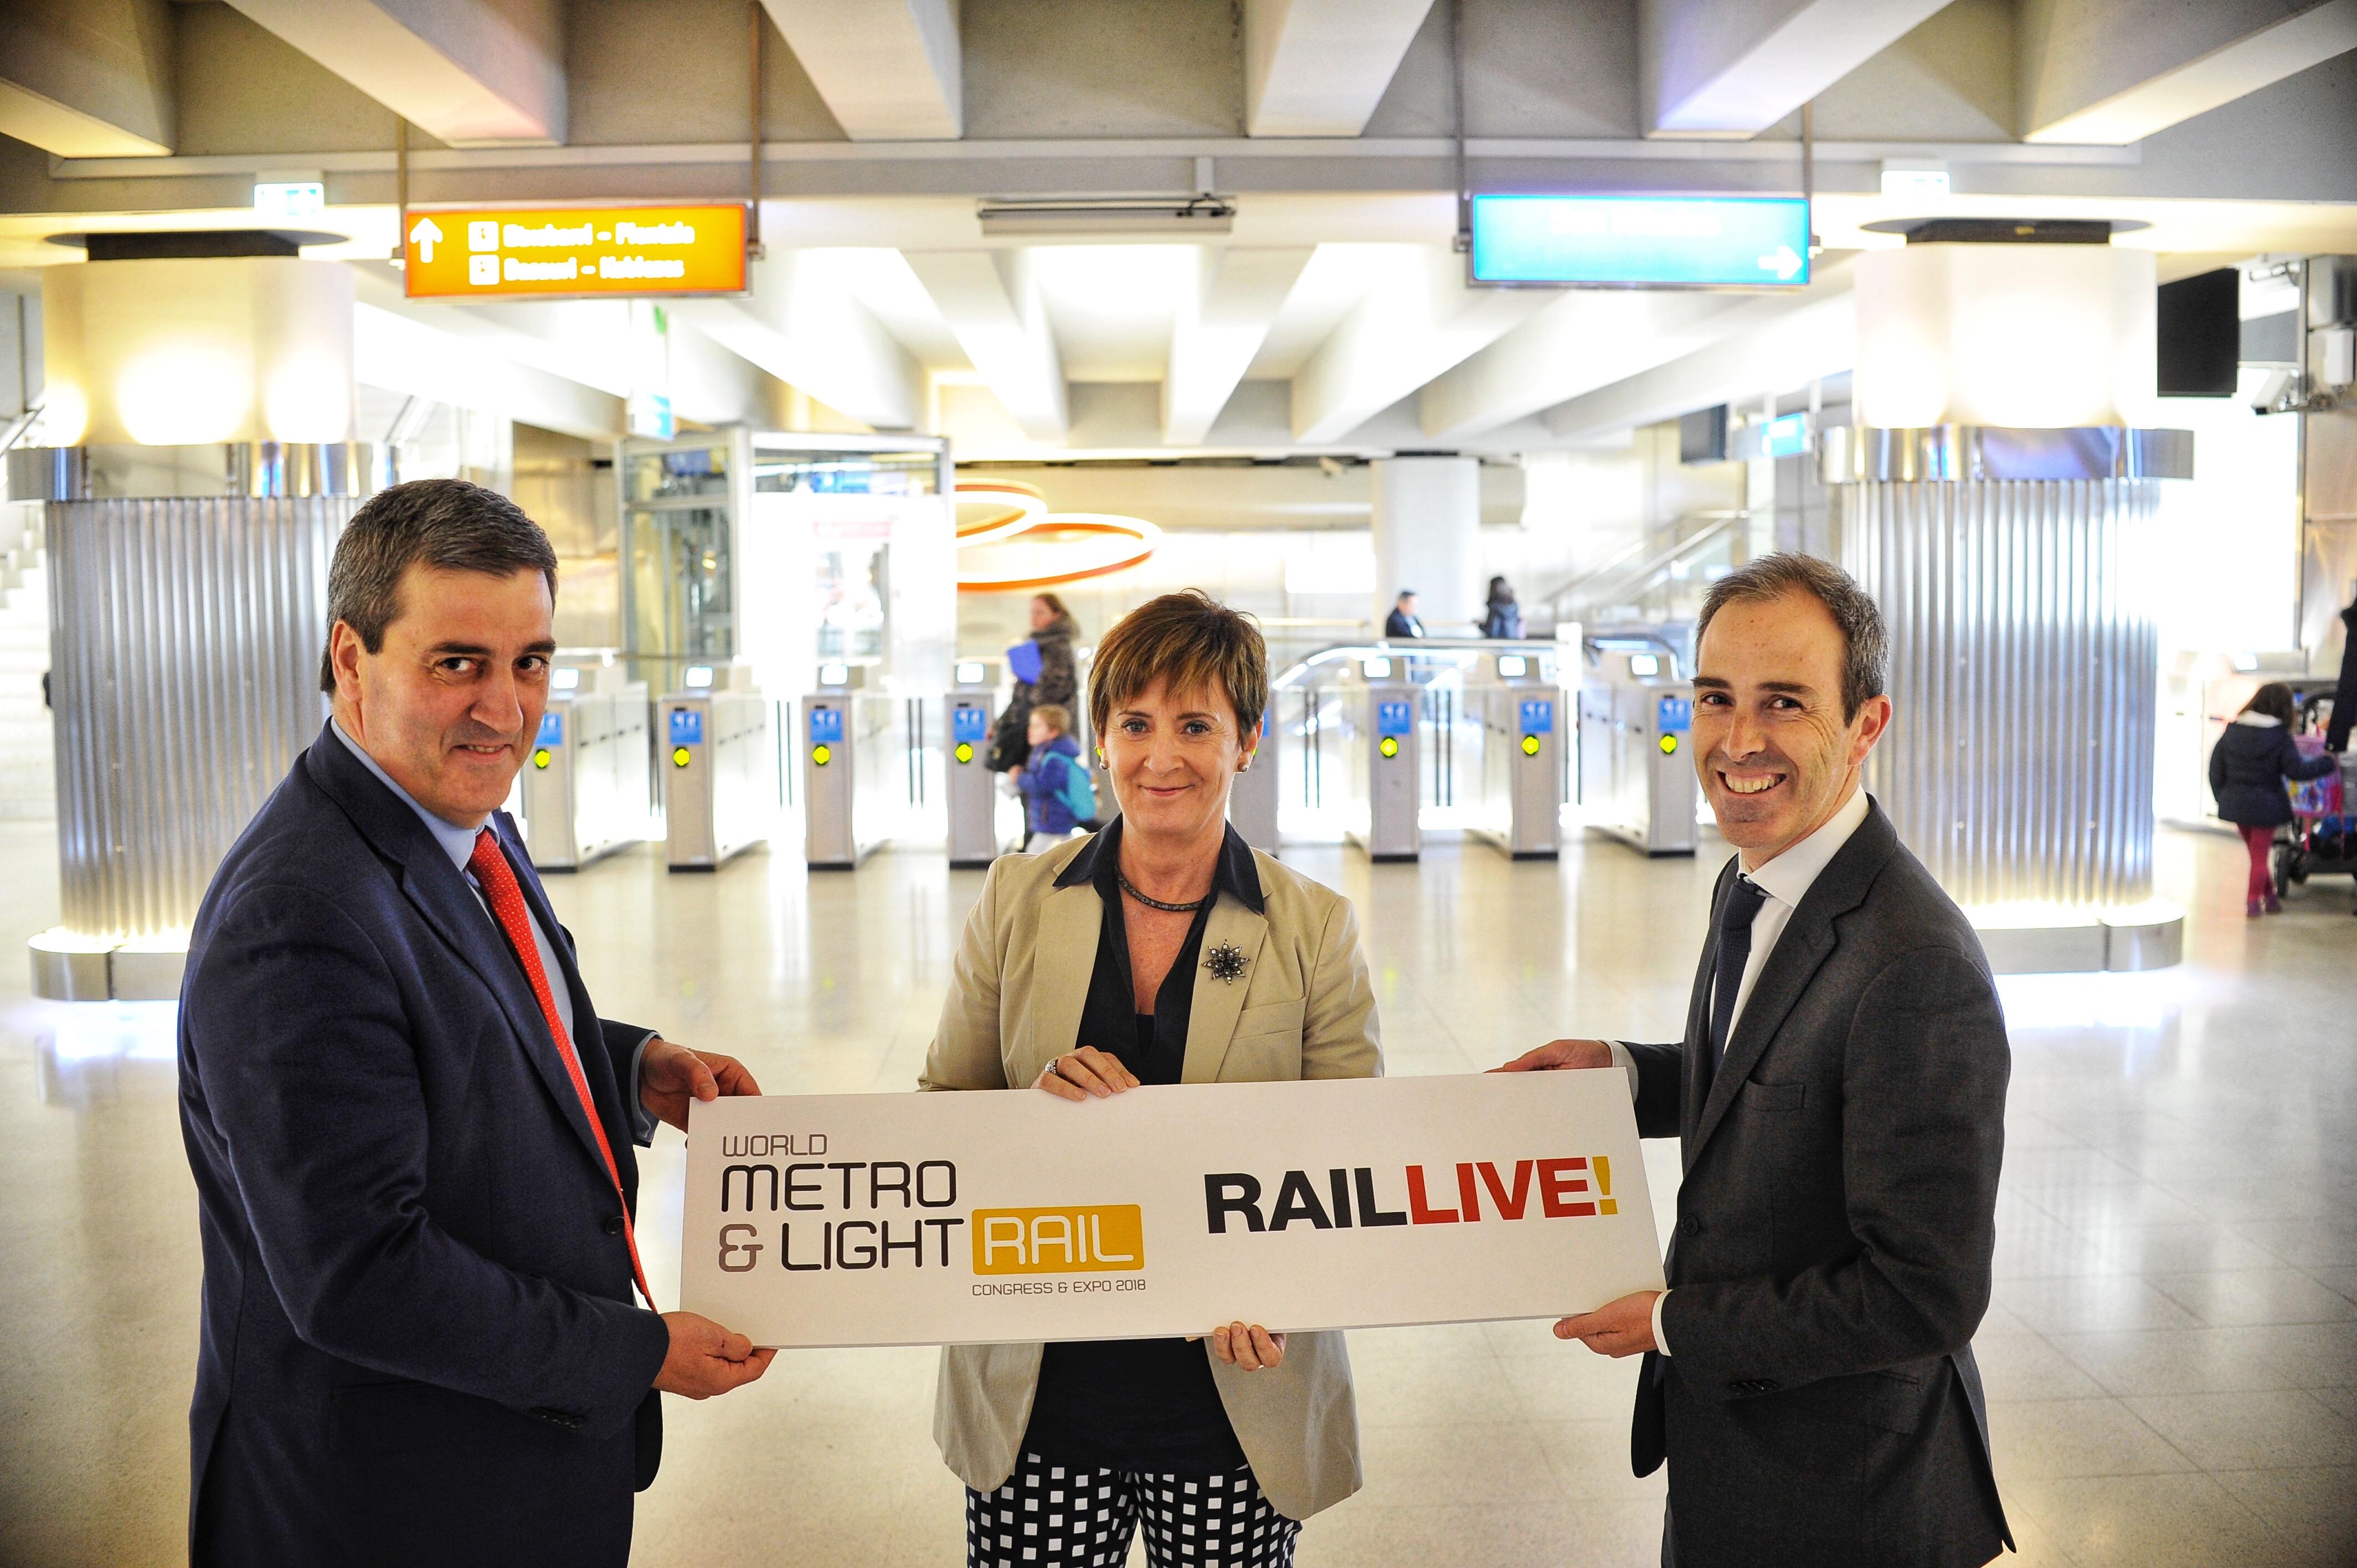 metro_rail_04.jpg